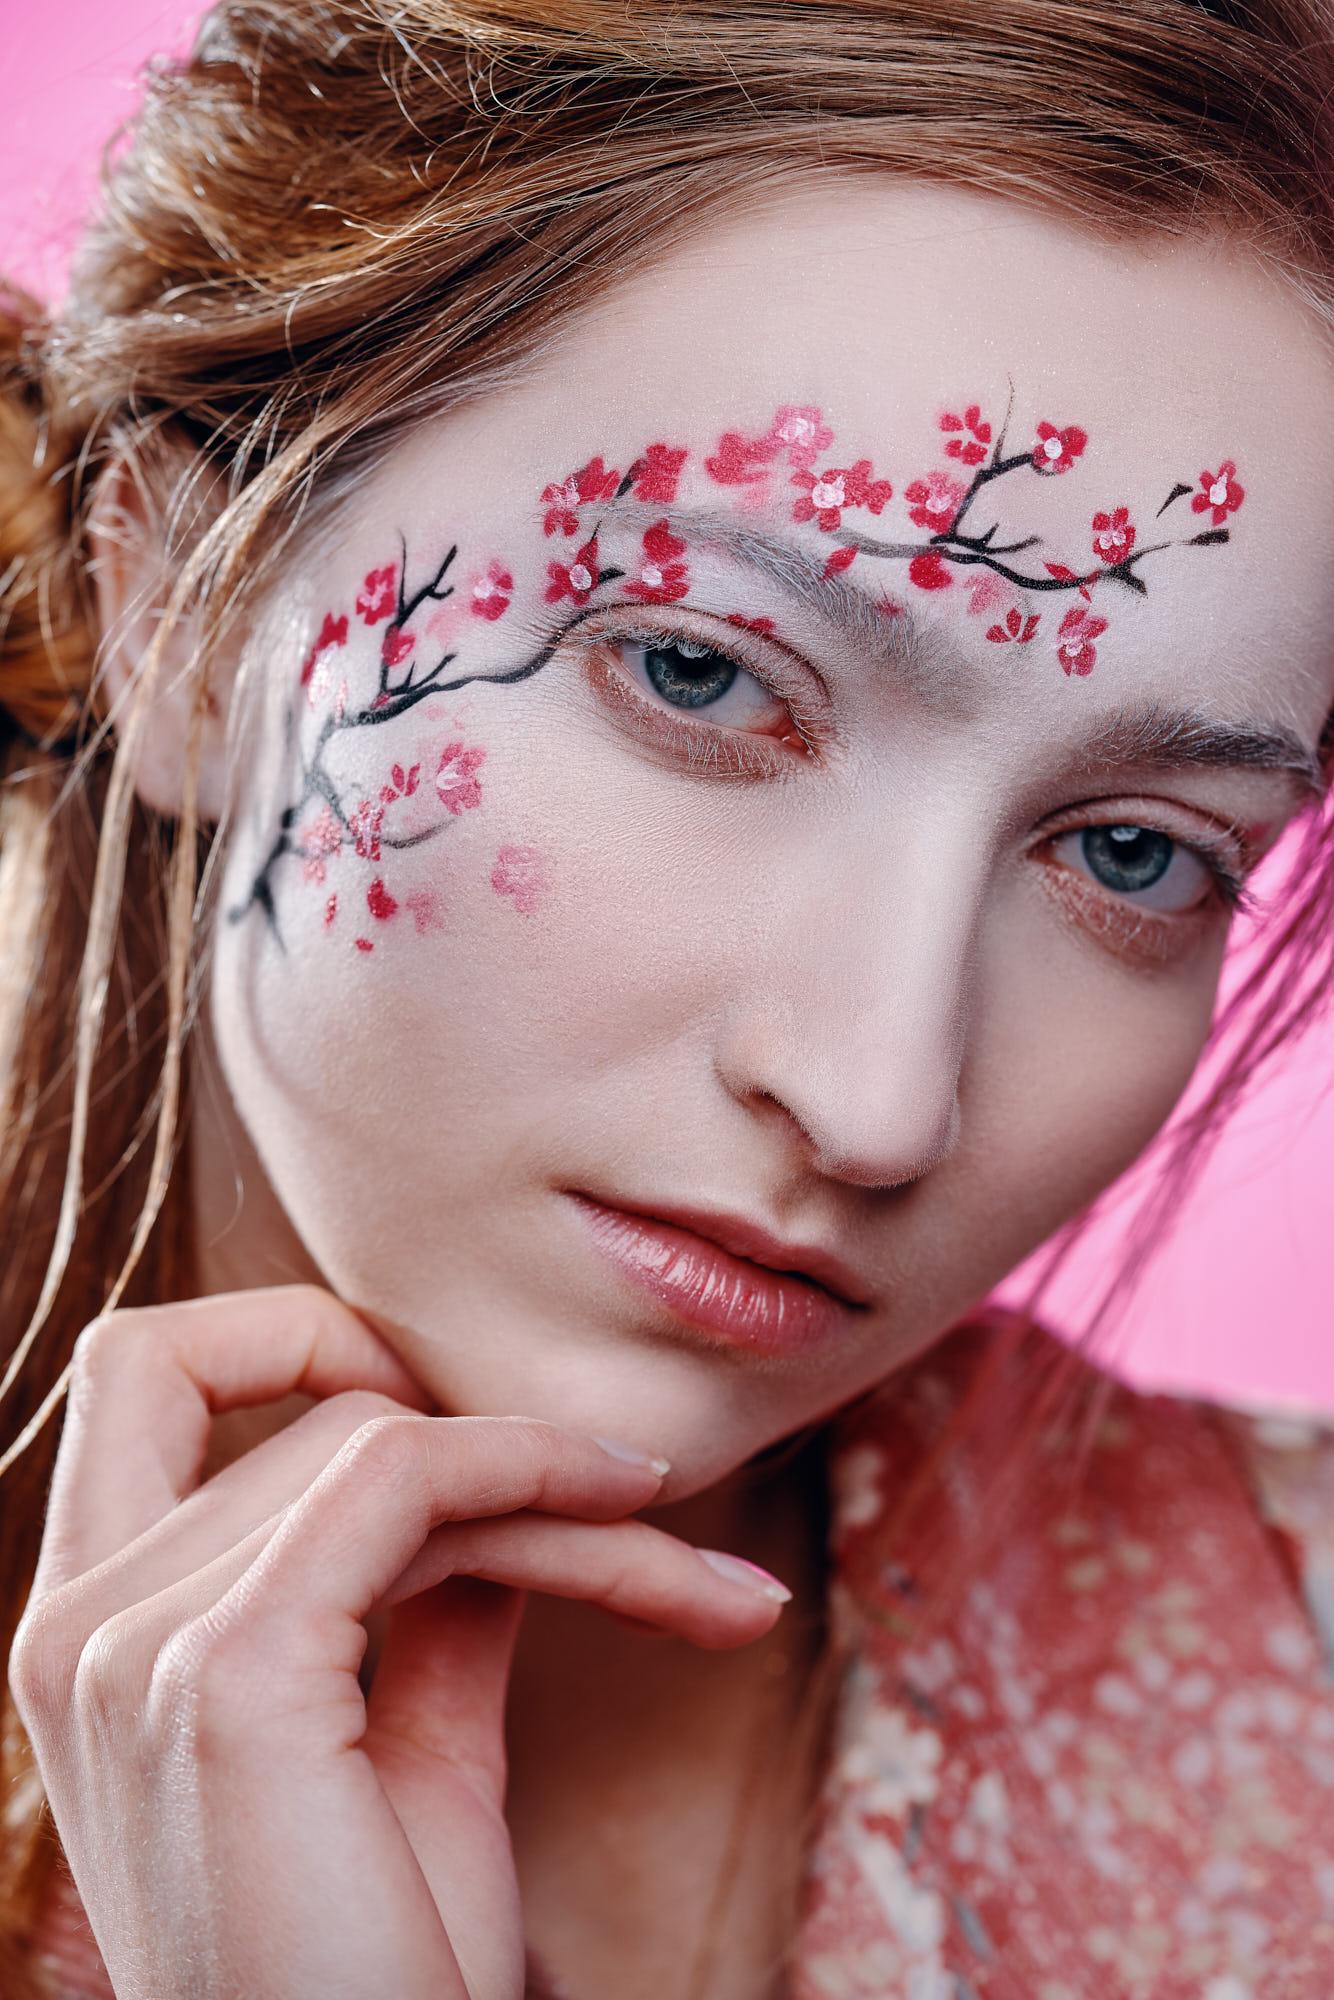 Lex & Josh Tiffanys Pro Makeup Spring Studio Shoot with Mika 14.jpg